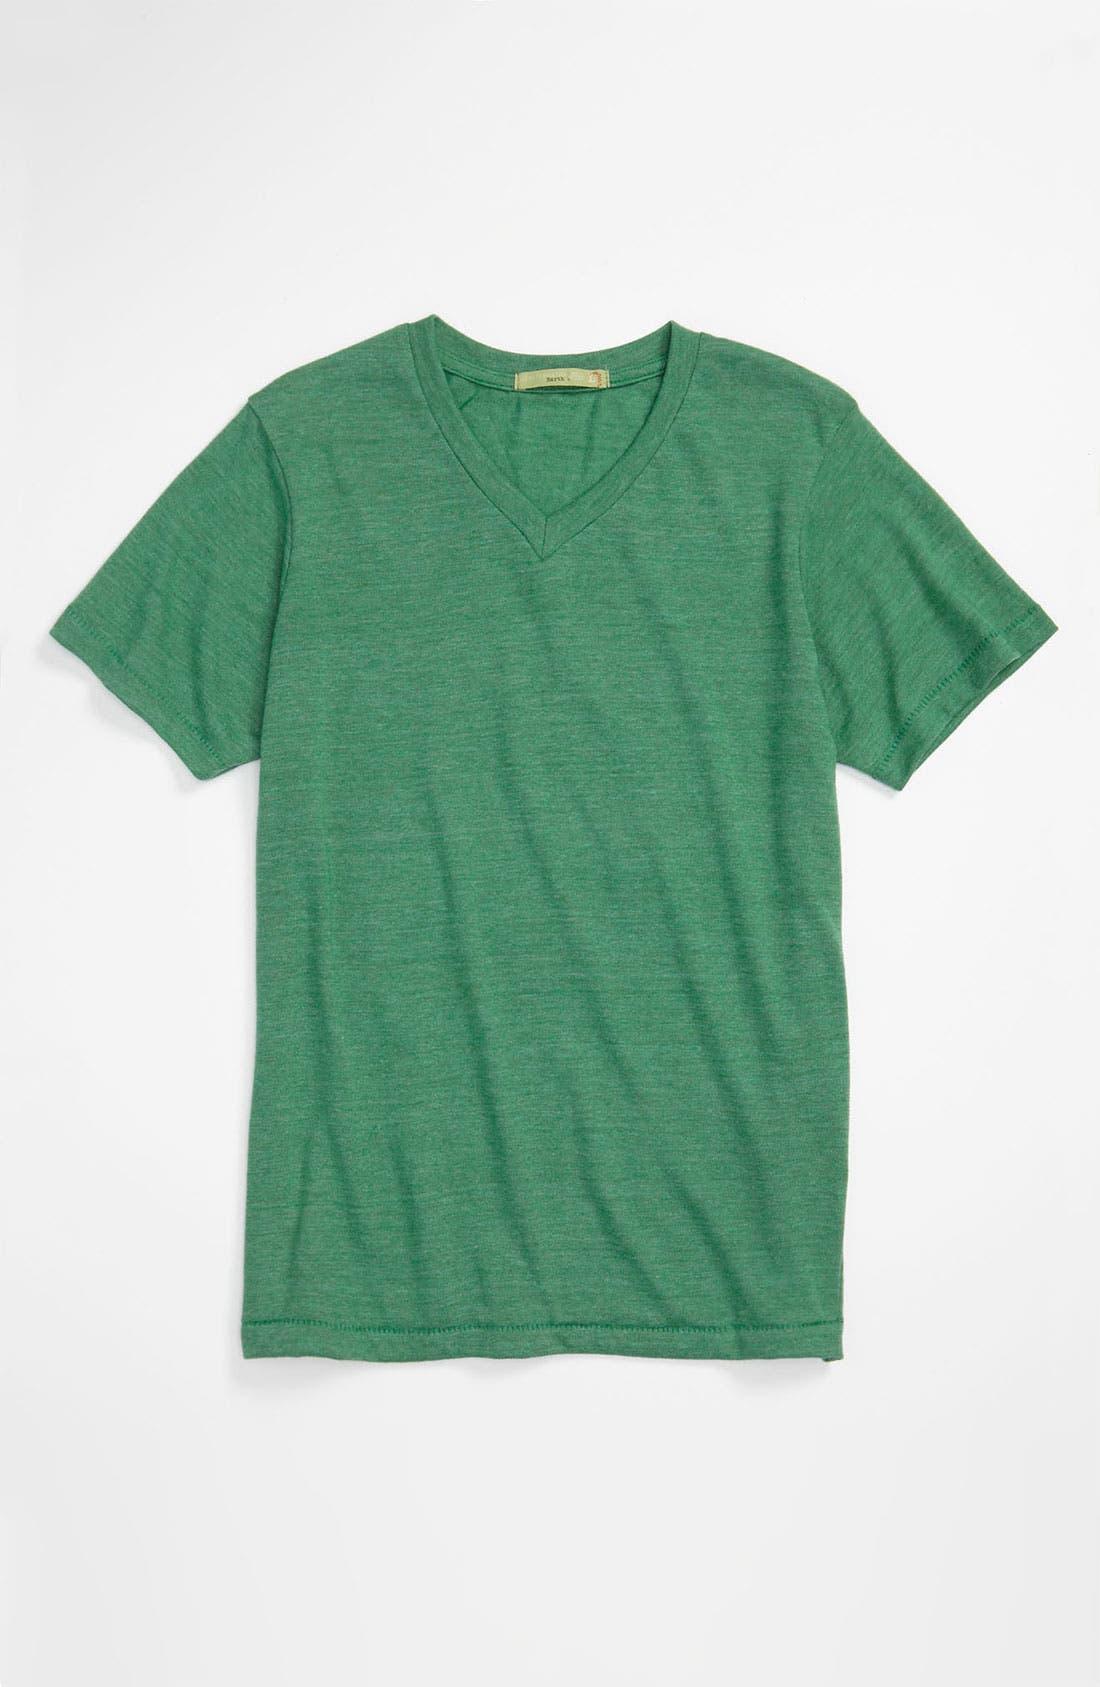 Main Image - Alternative 'Boss' V-Neck T-Shirt (Little Boys & Big Boys)